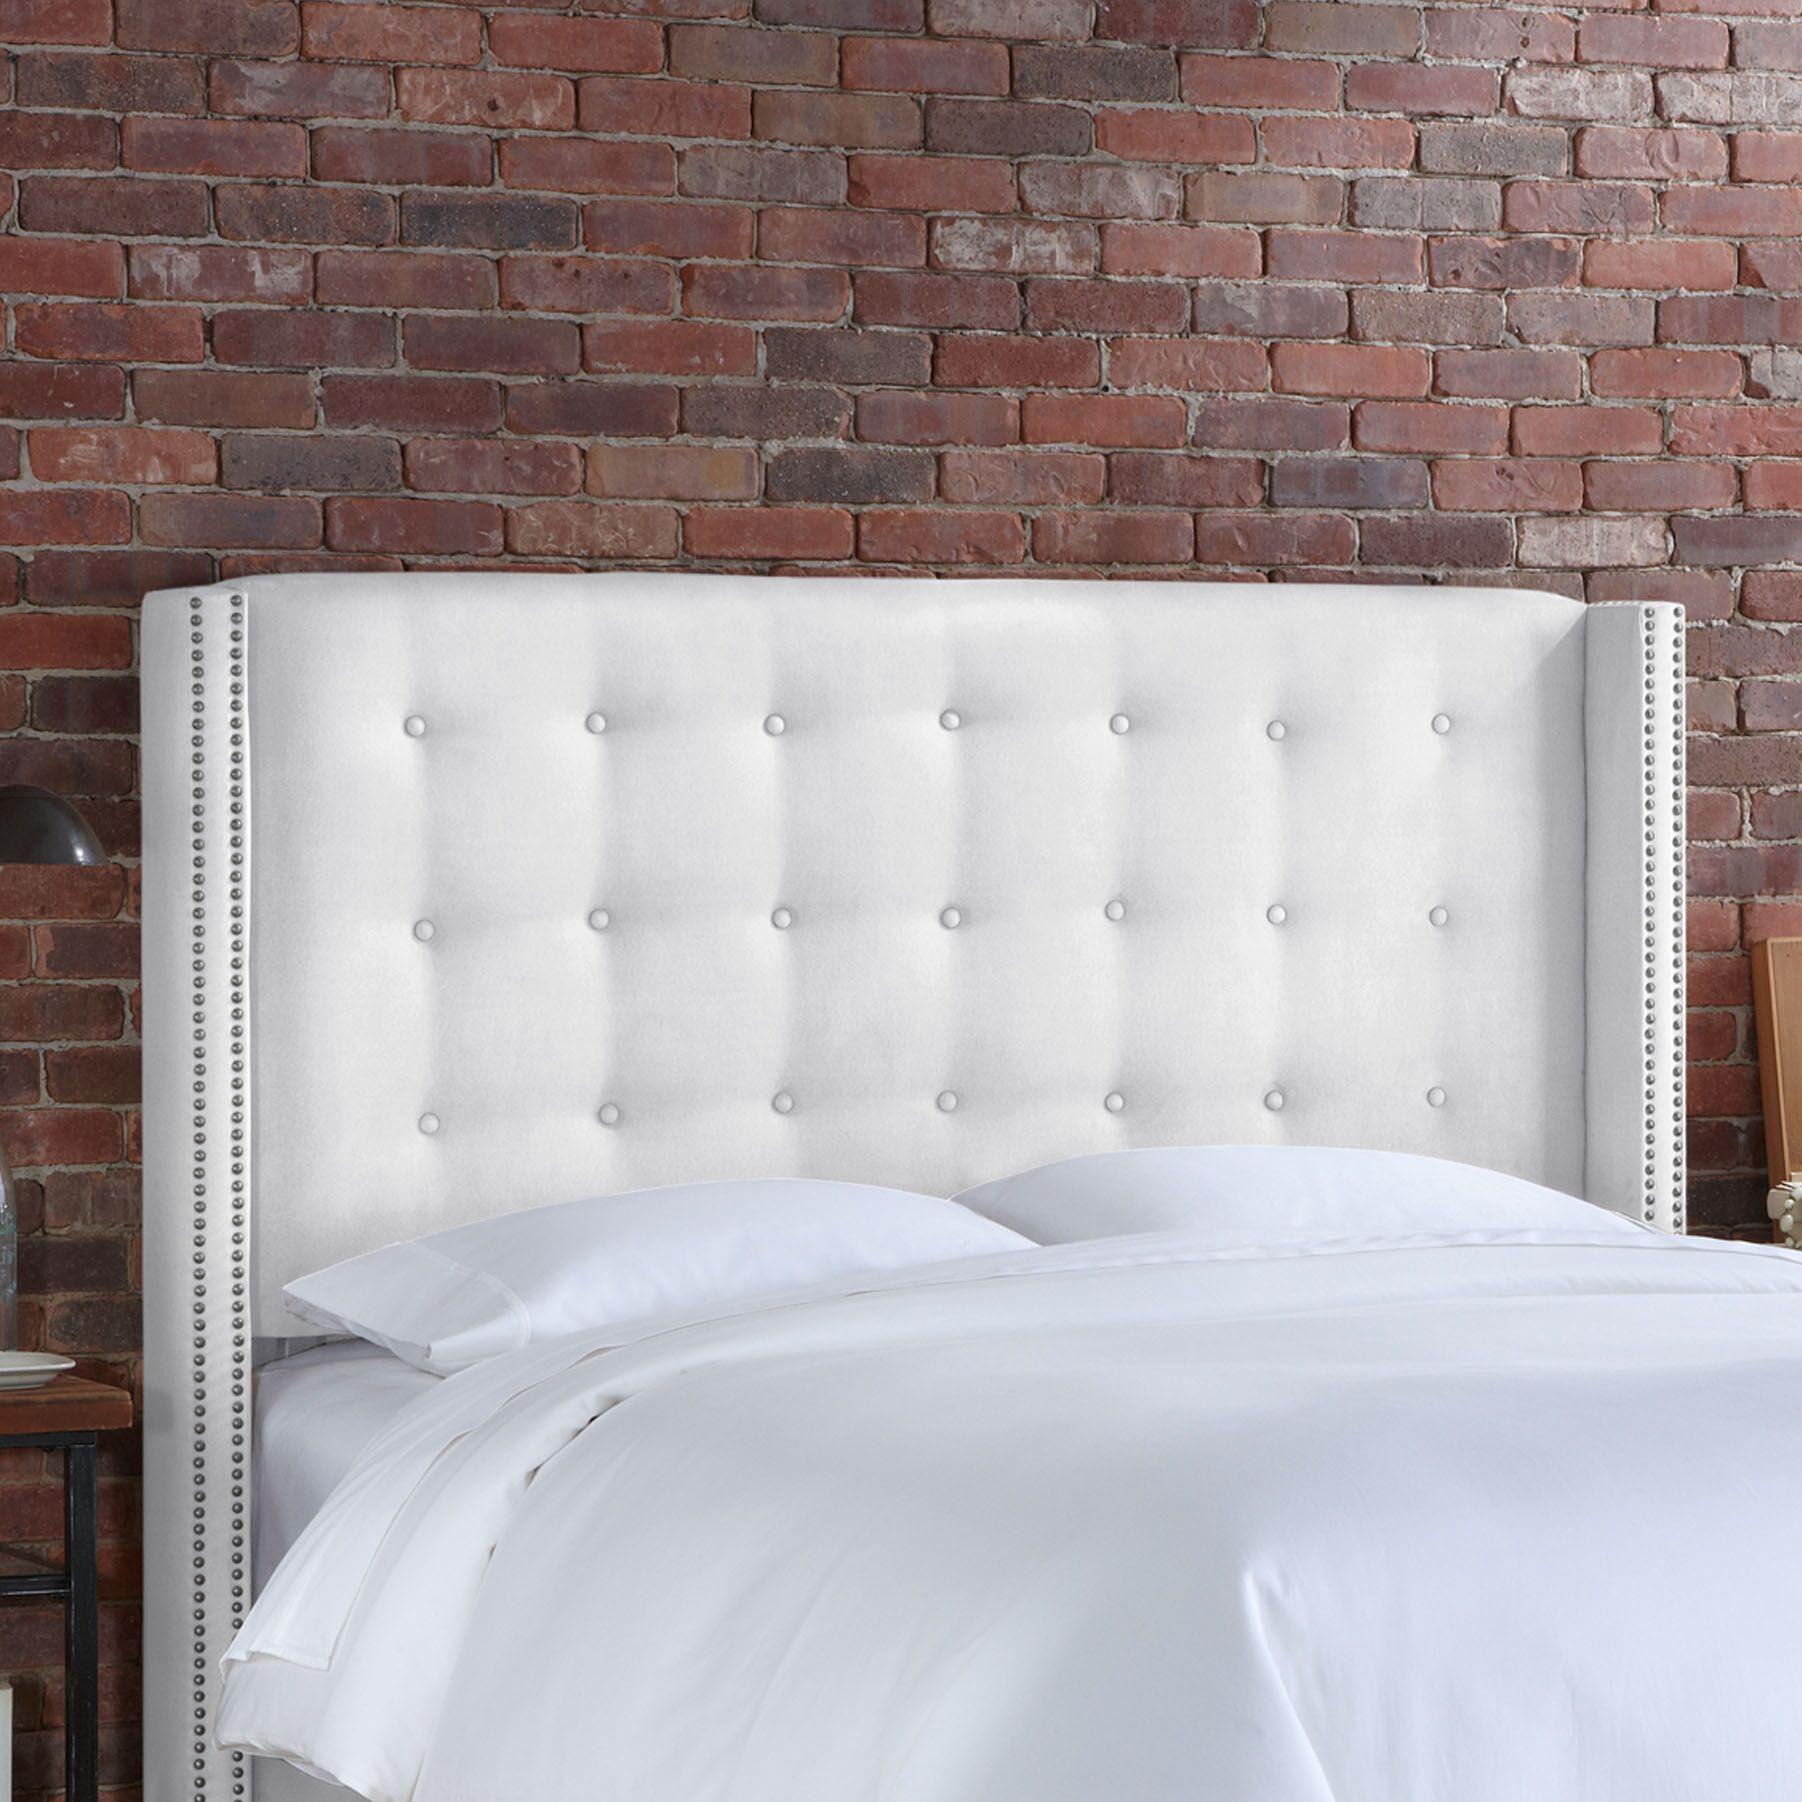 Doleman Upholstered Wingback Headboard Upholstery: White, Size: California King